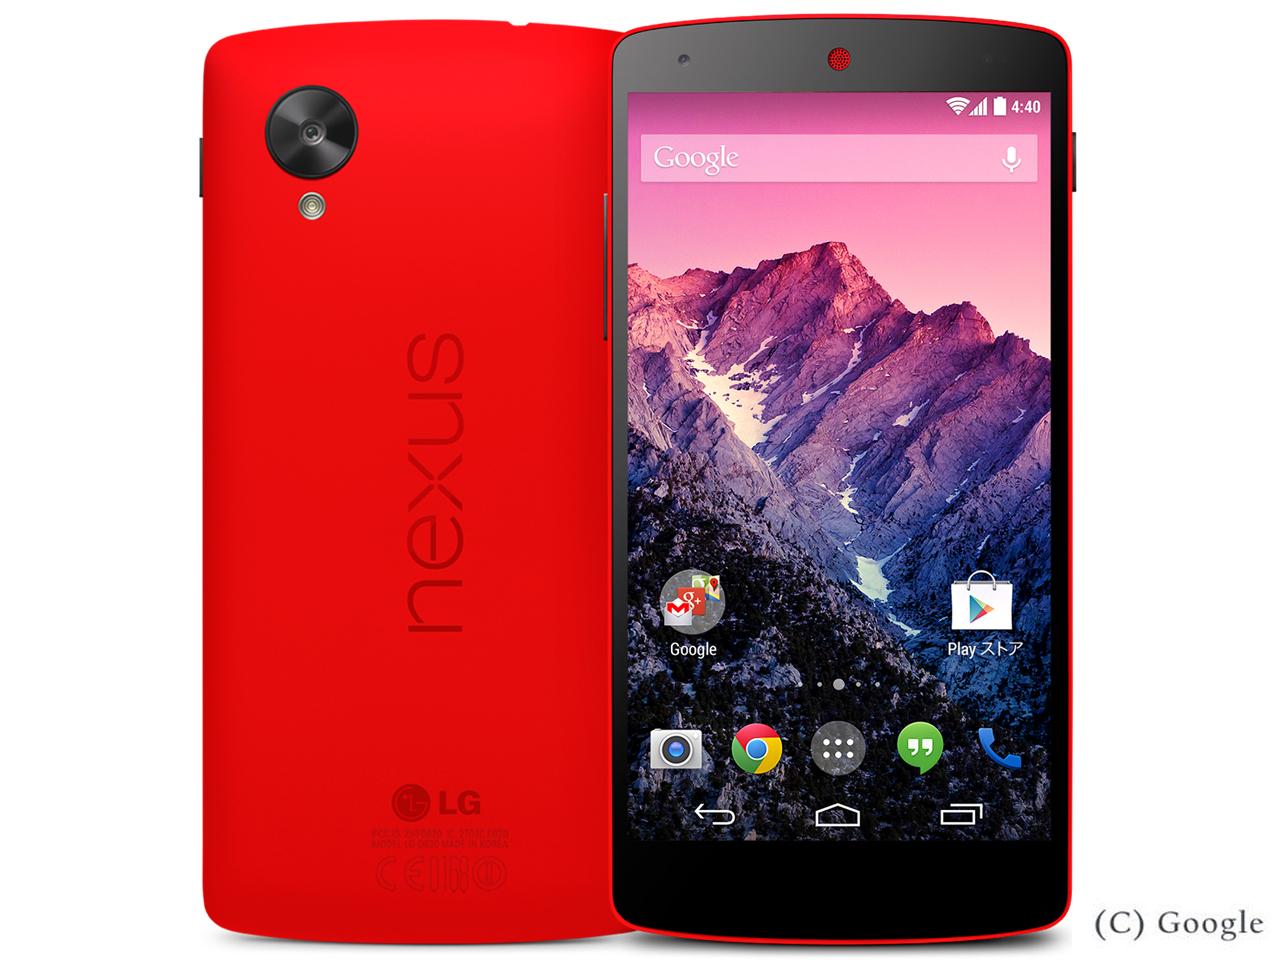 Nexus 5 EM01L 32GB イー・モバイル [ブライト レッド] の製品画像